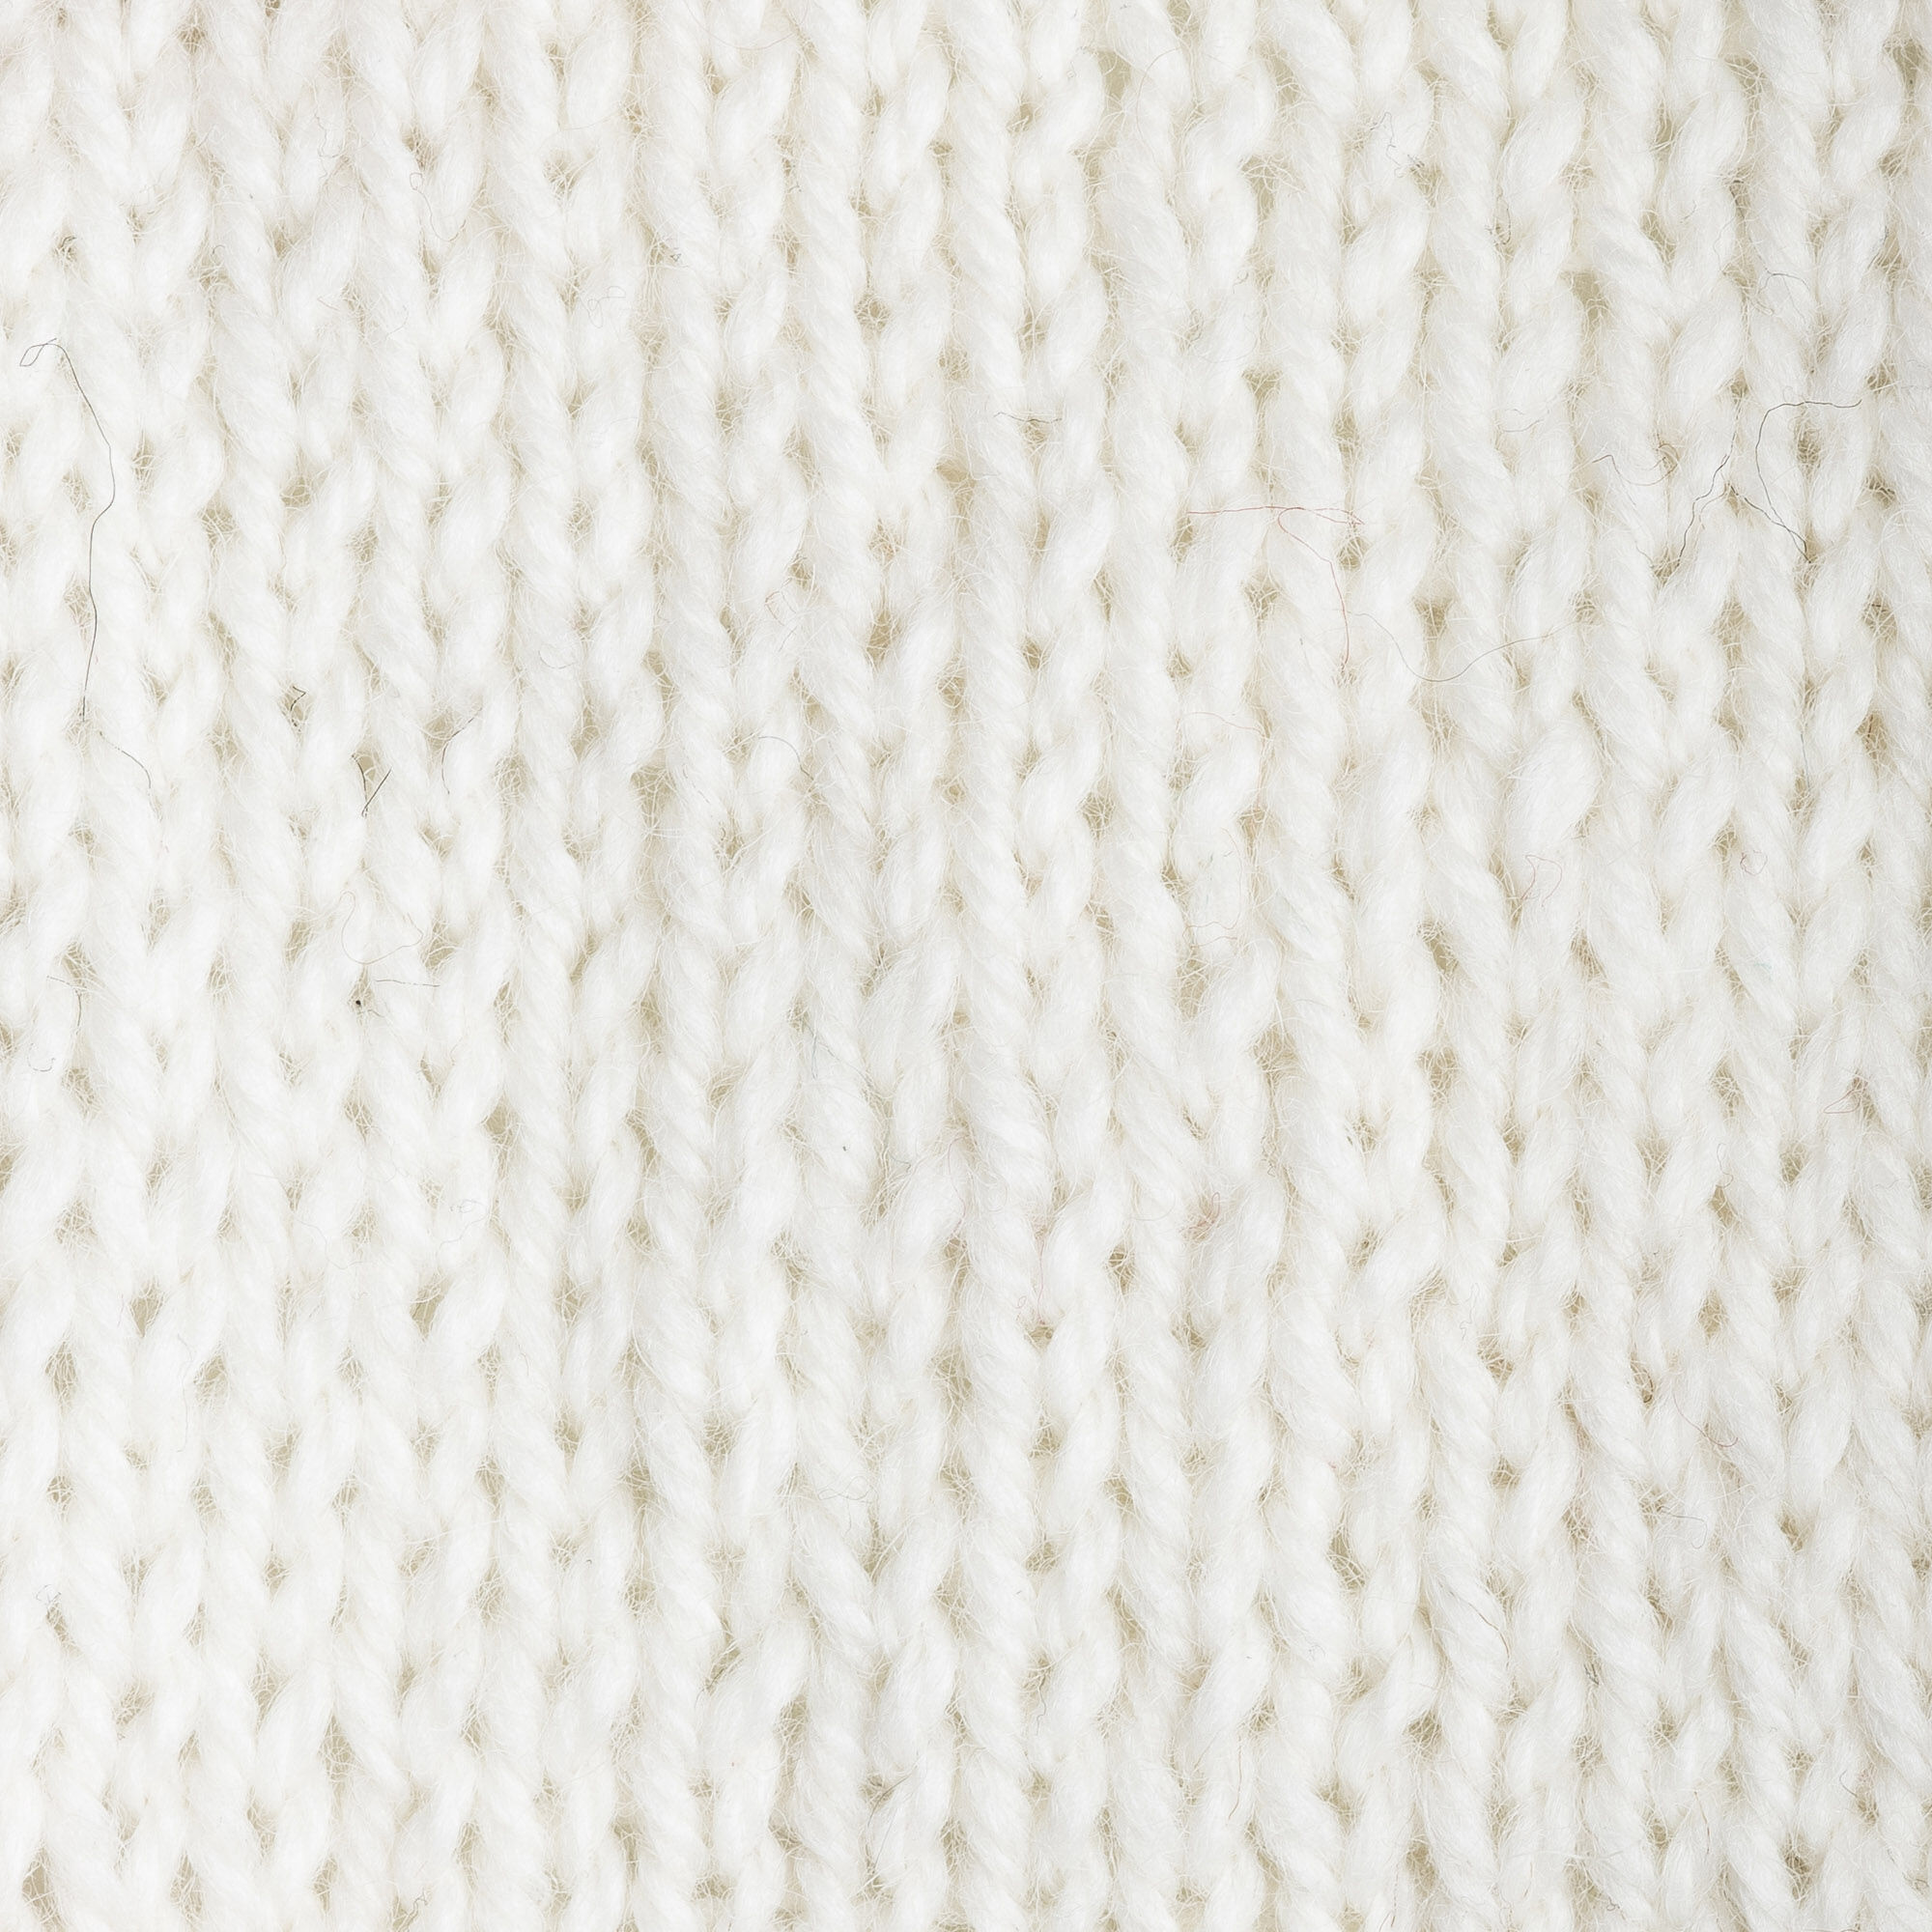 Patons Classic Wool Worsted Yarn, Winter White | Yarnspirations